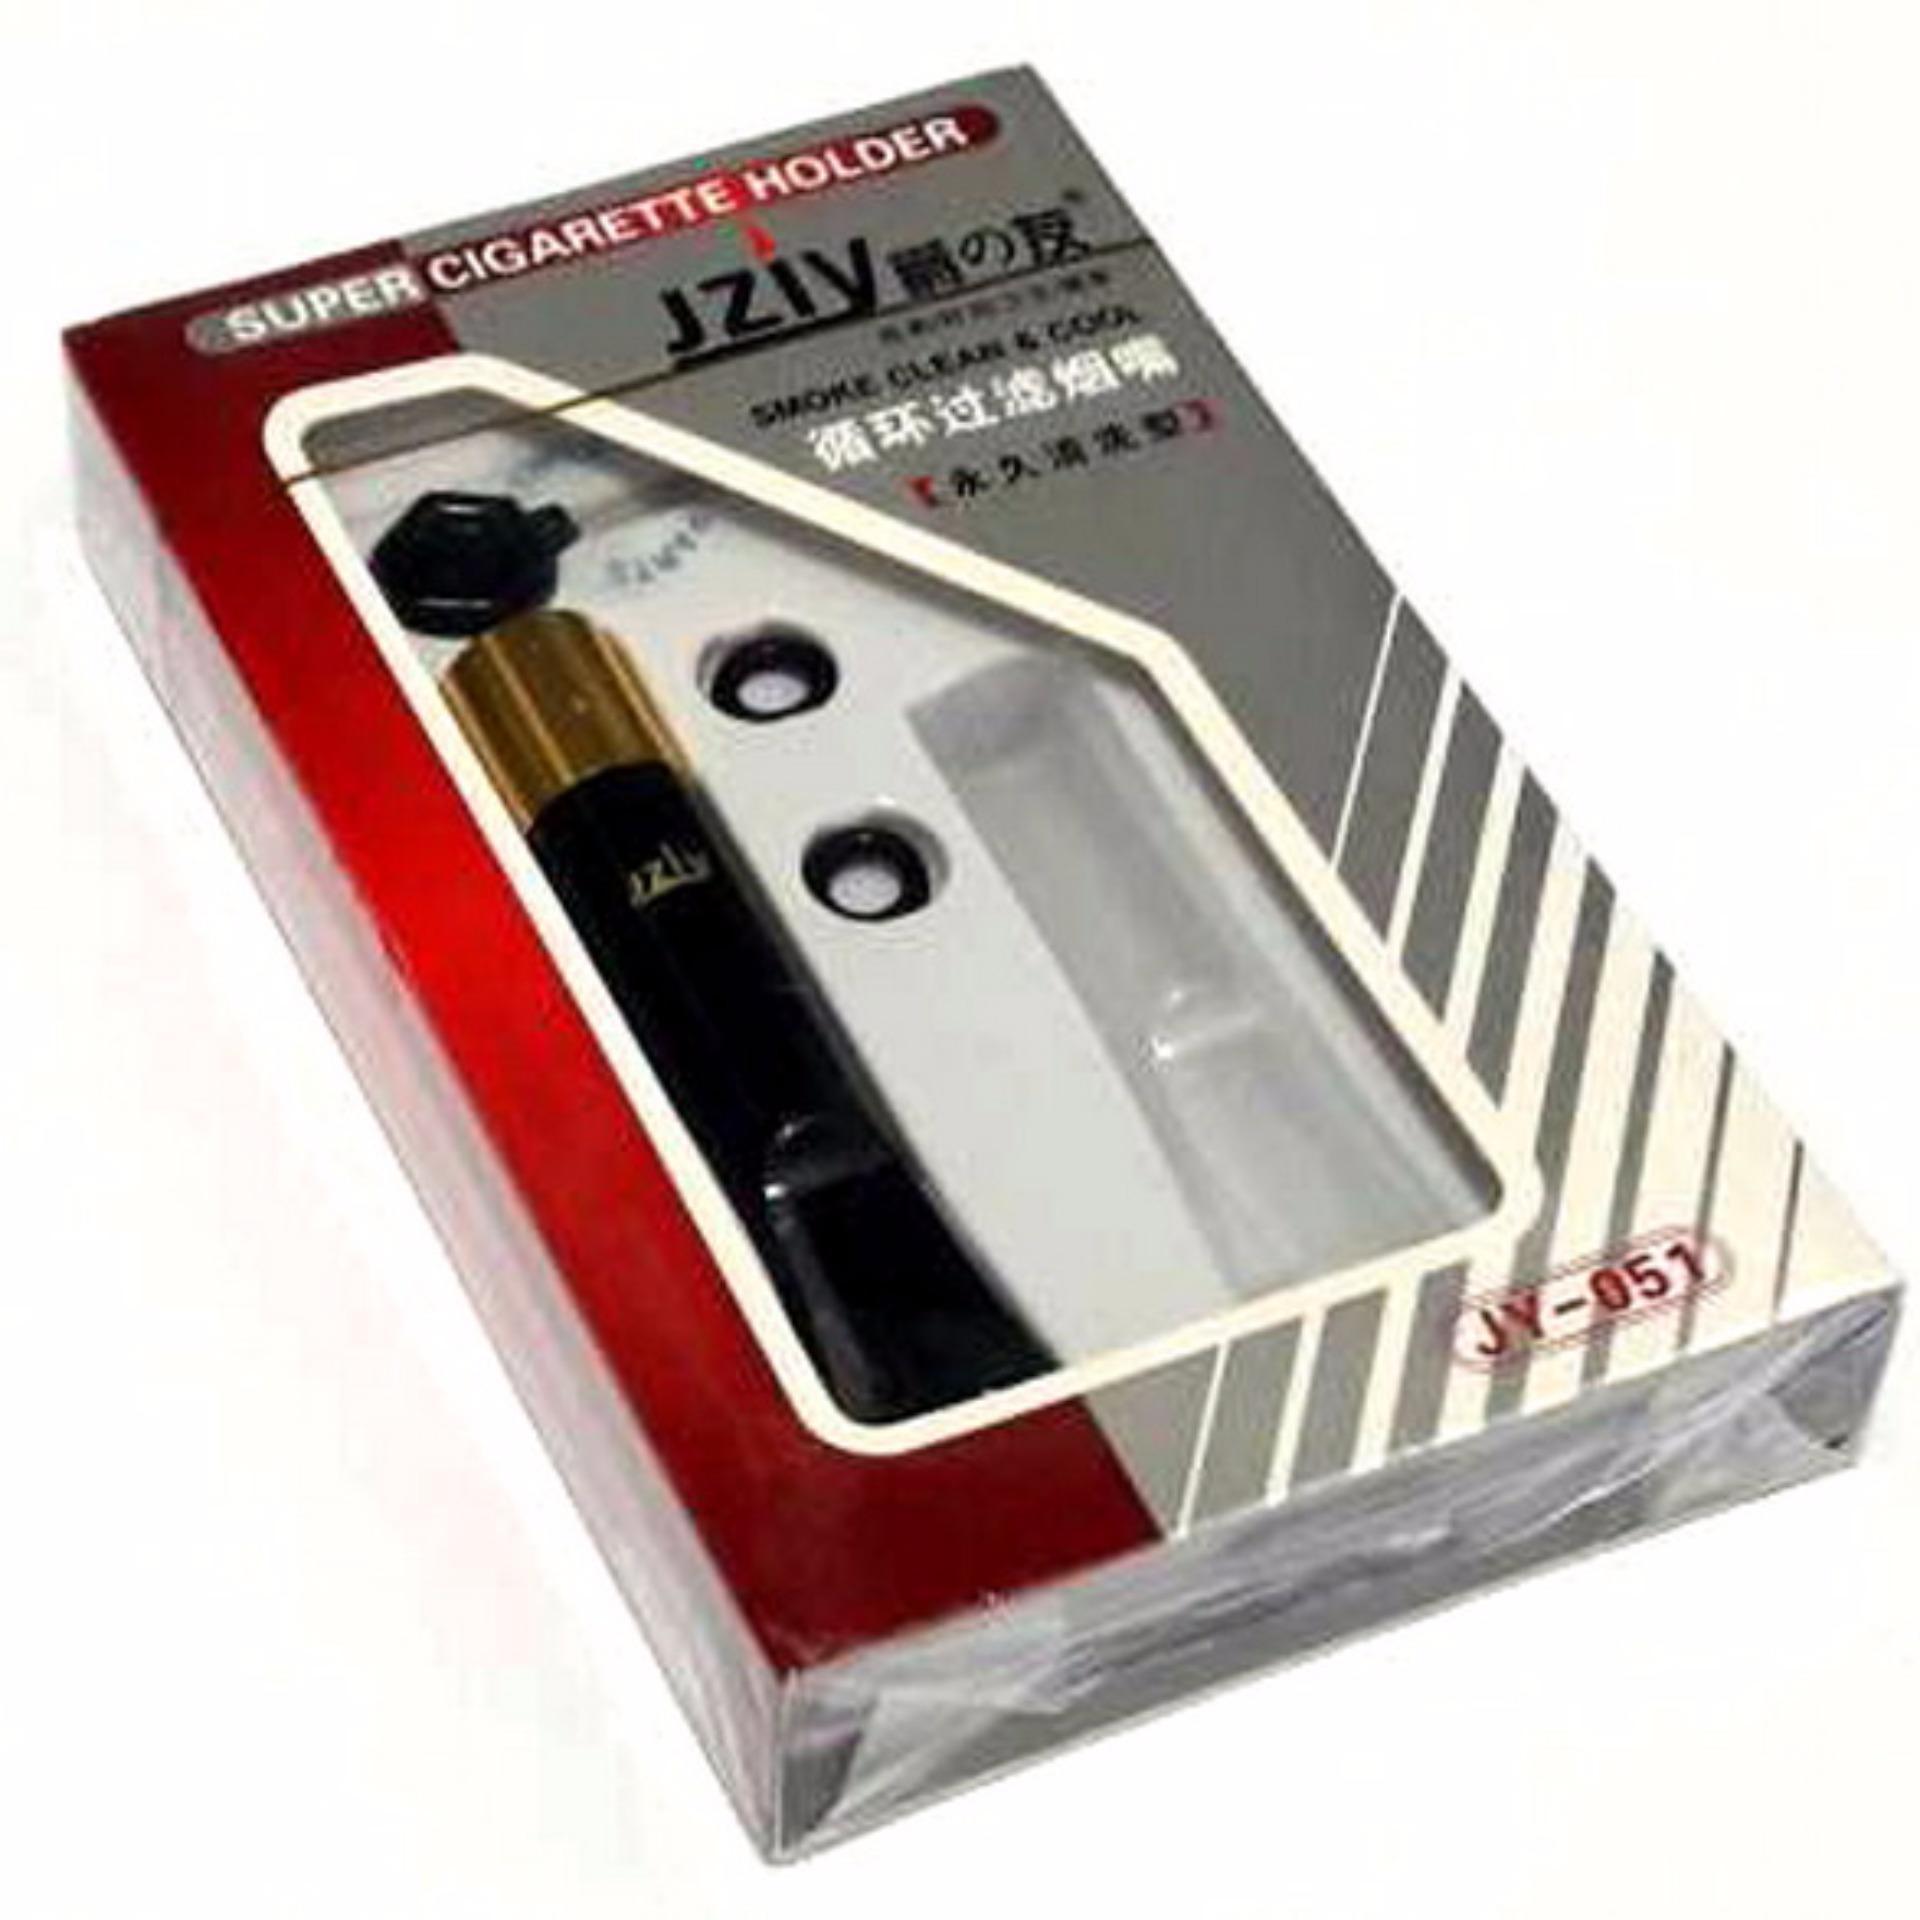 jziy jy-051 silver filter rokok permanen ukuran standard